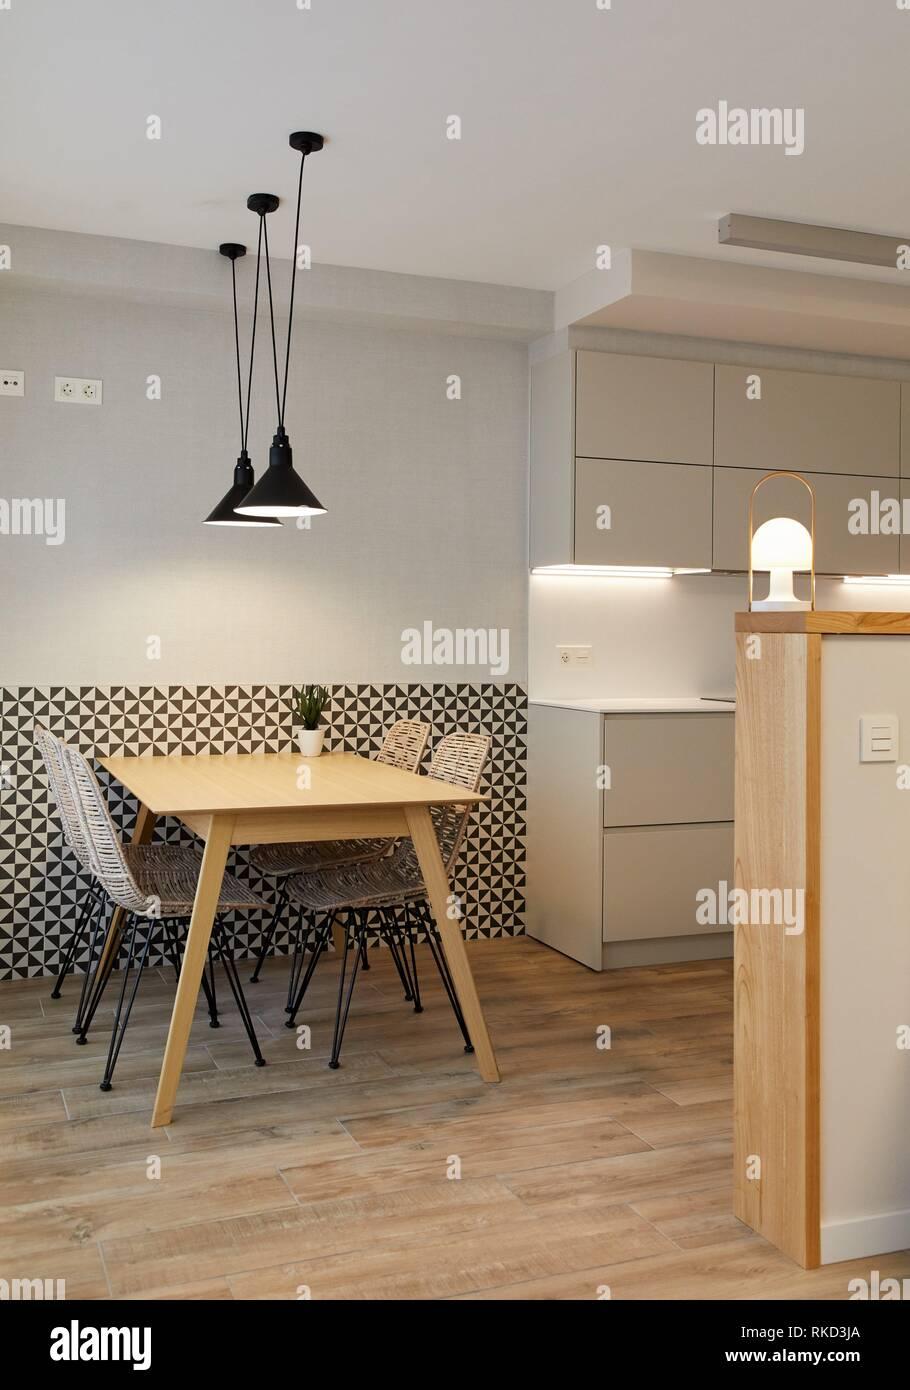 Dining room and kitchen, illumination, Interior decoration of housing, O–ati, Gipuzkoa, Basque Country, Spain, Europe - Stock Image